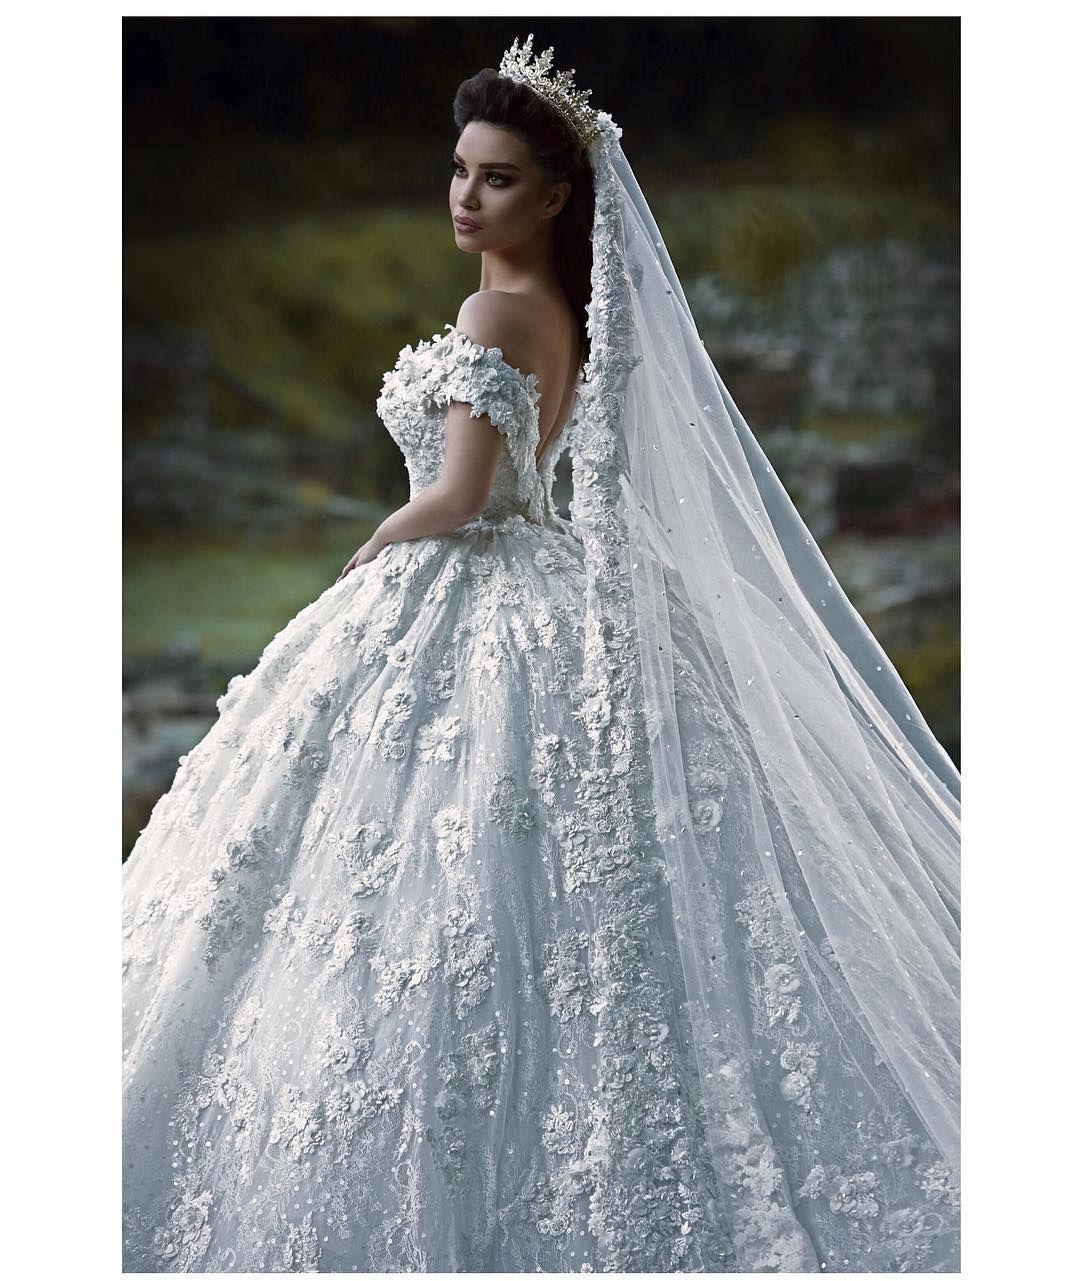 Pin by erica garin on Wedding dresses | Pinterest | Wedding dress ...